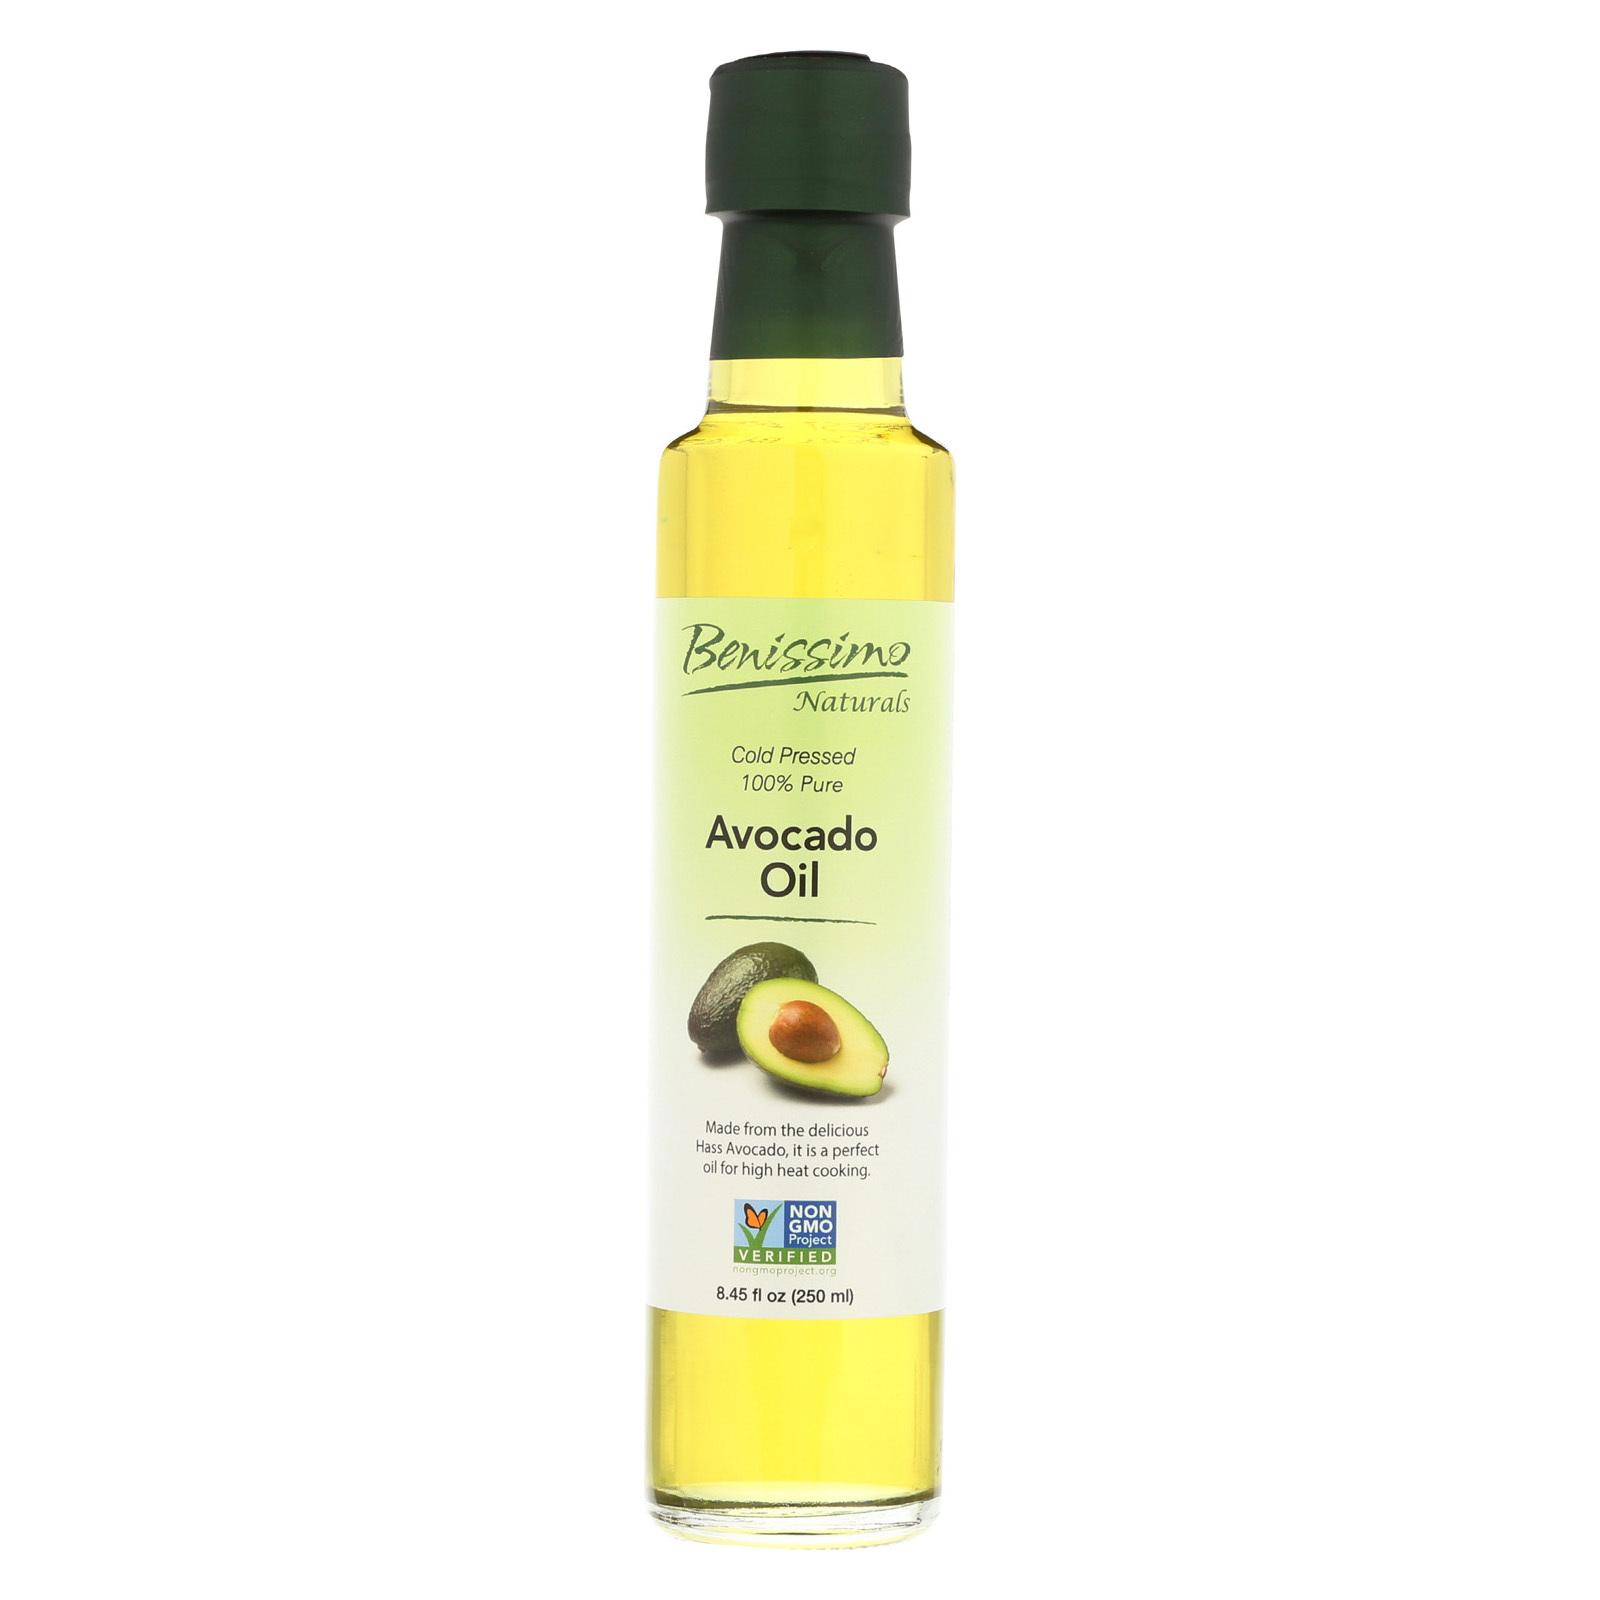 Benissimo Oil - Avocado - Case of 6 - 8.45 fl oz